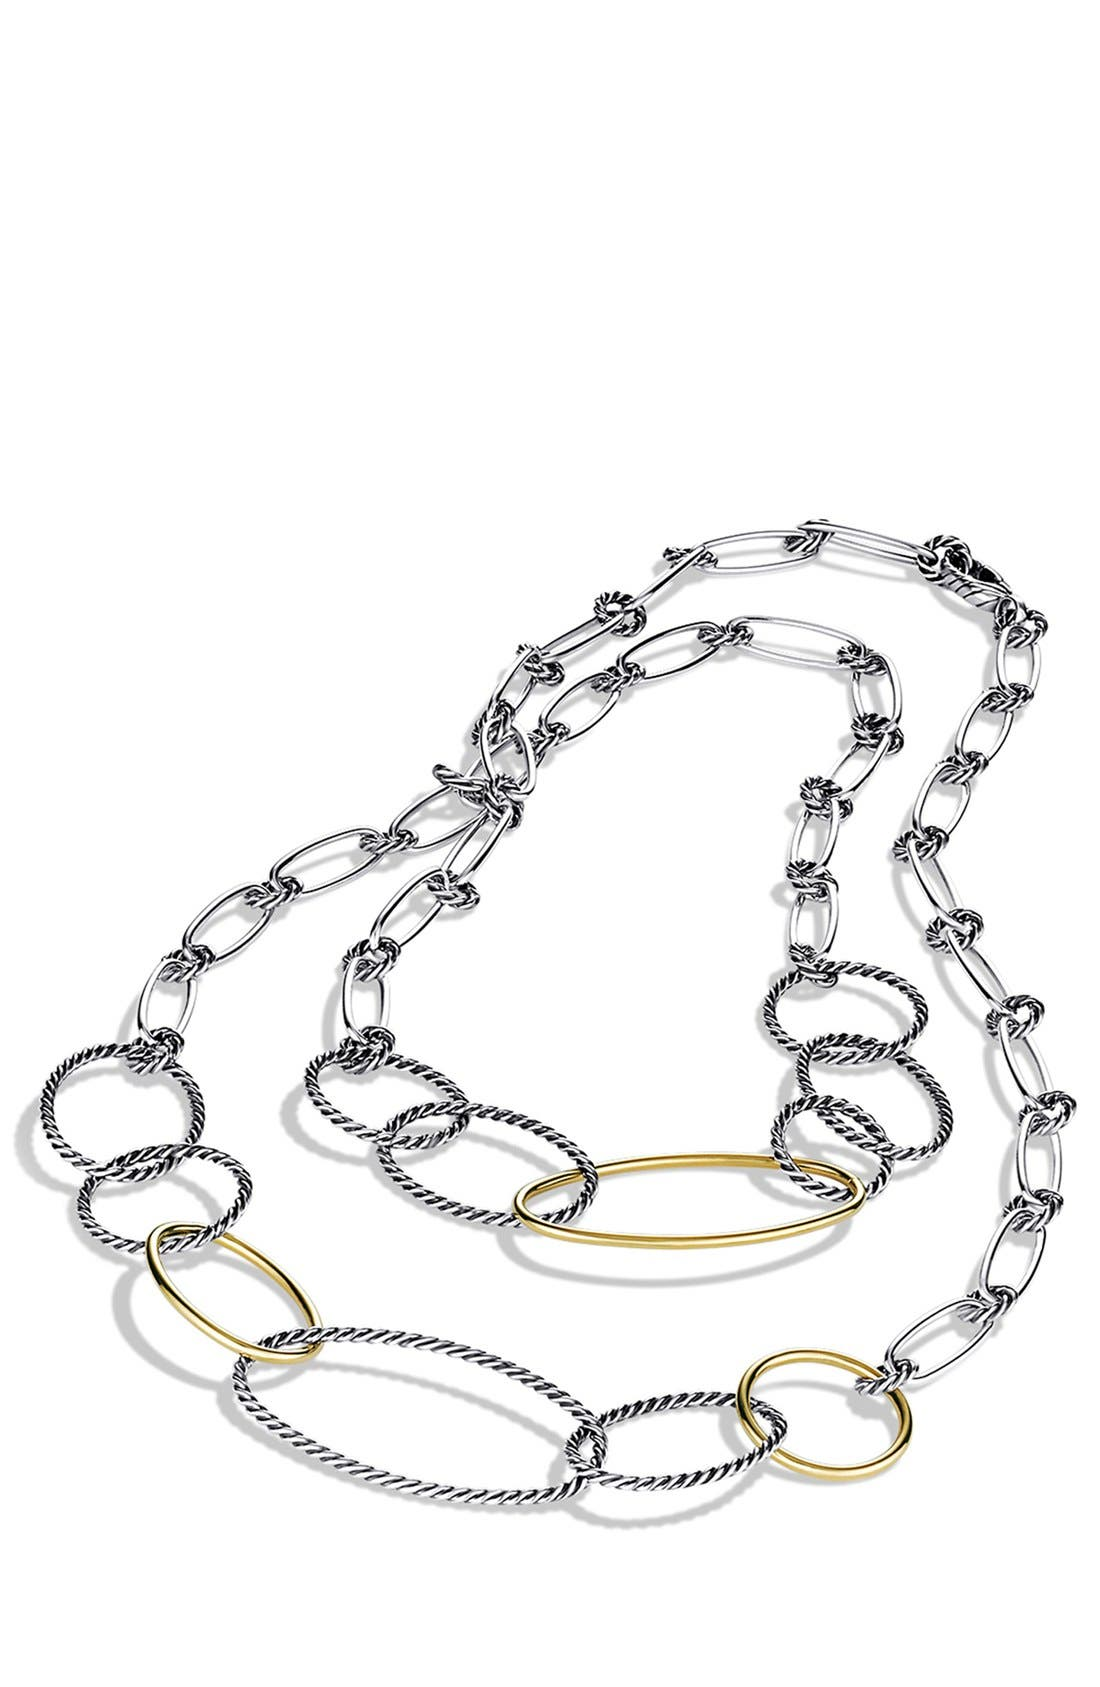 Alternate Image 2  - David Yurman 'Mobile' Link Necklace with Gold